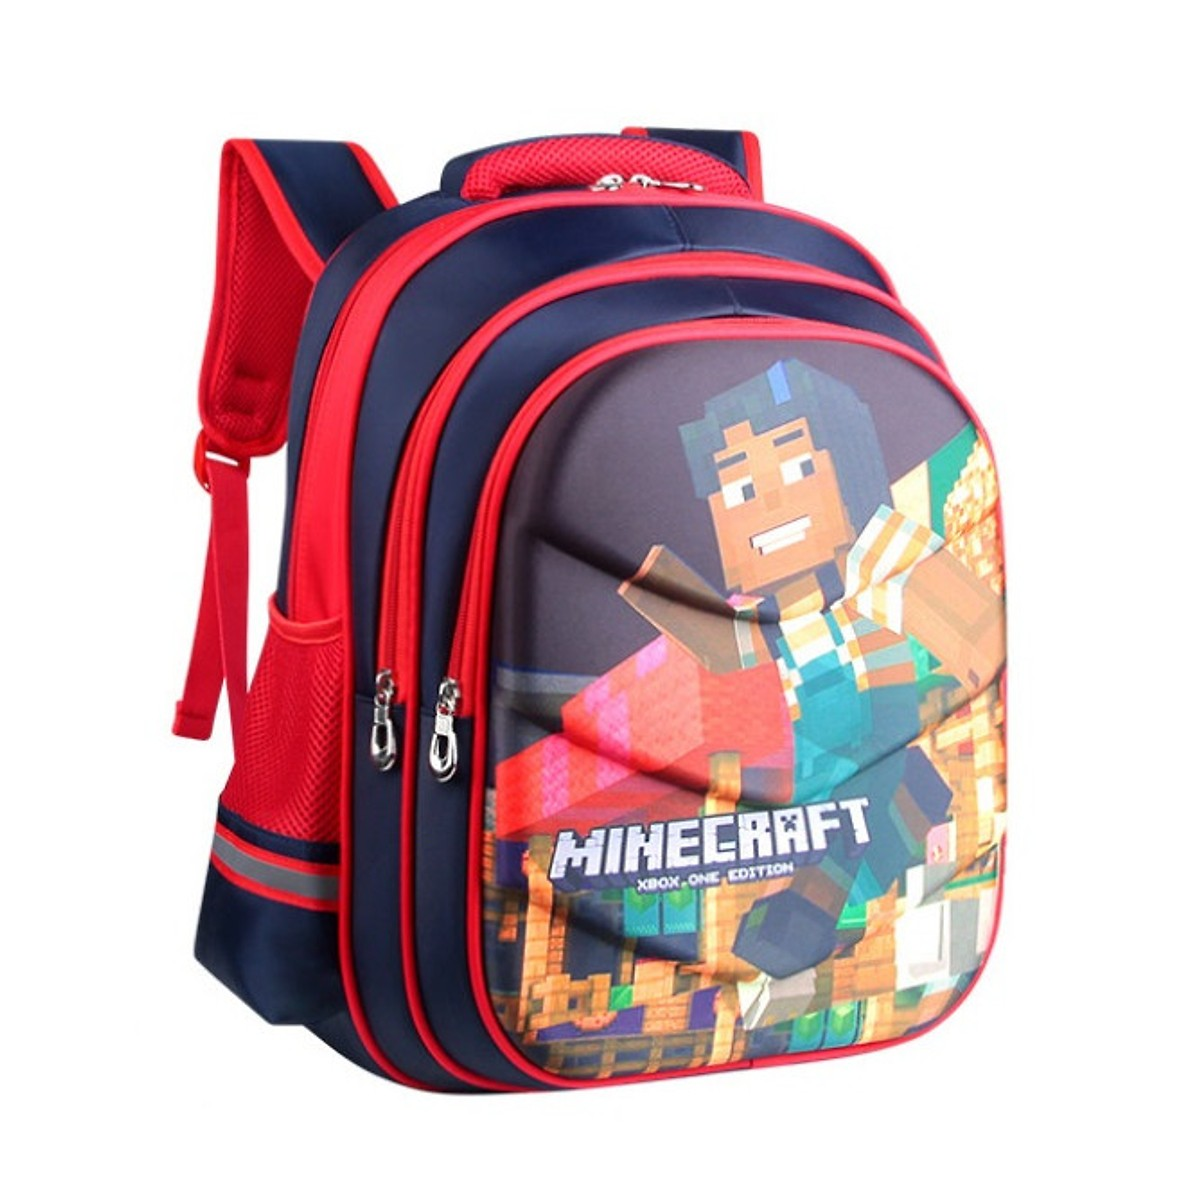 Balo cho bé Sesame Minecraft cho Học Sinh Cấp 1